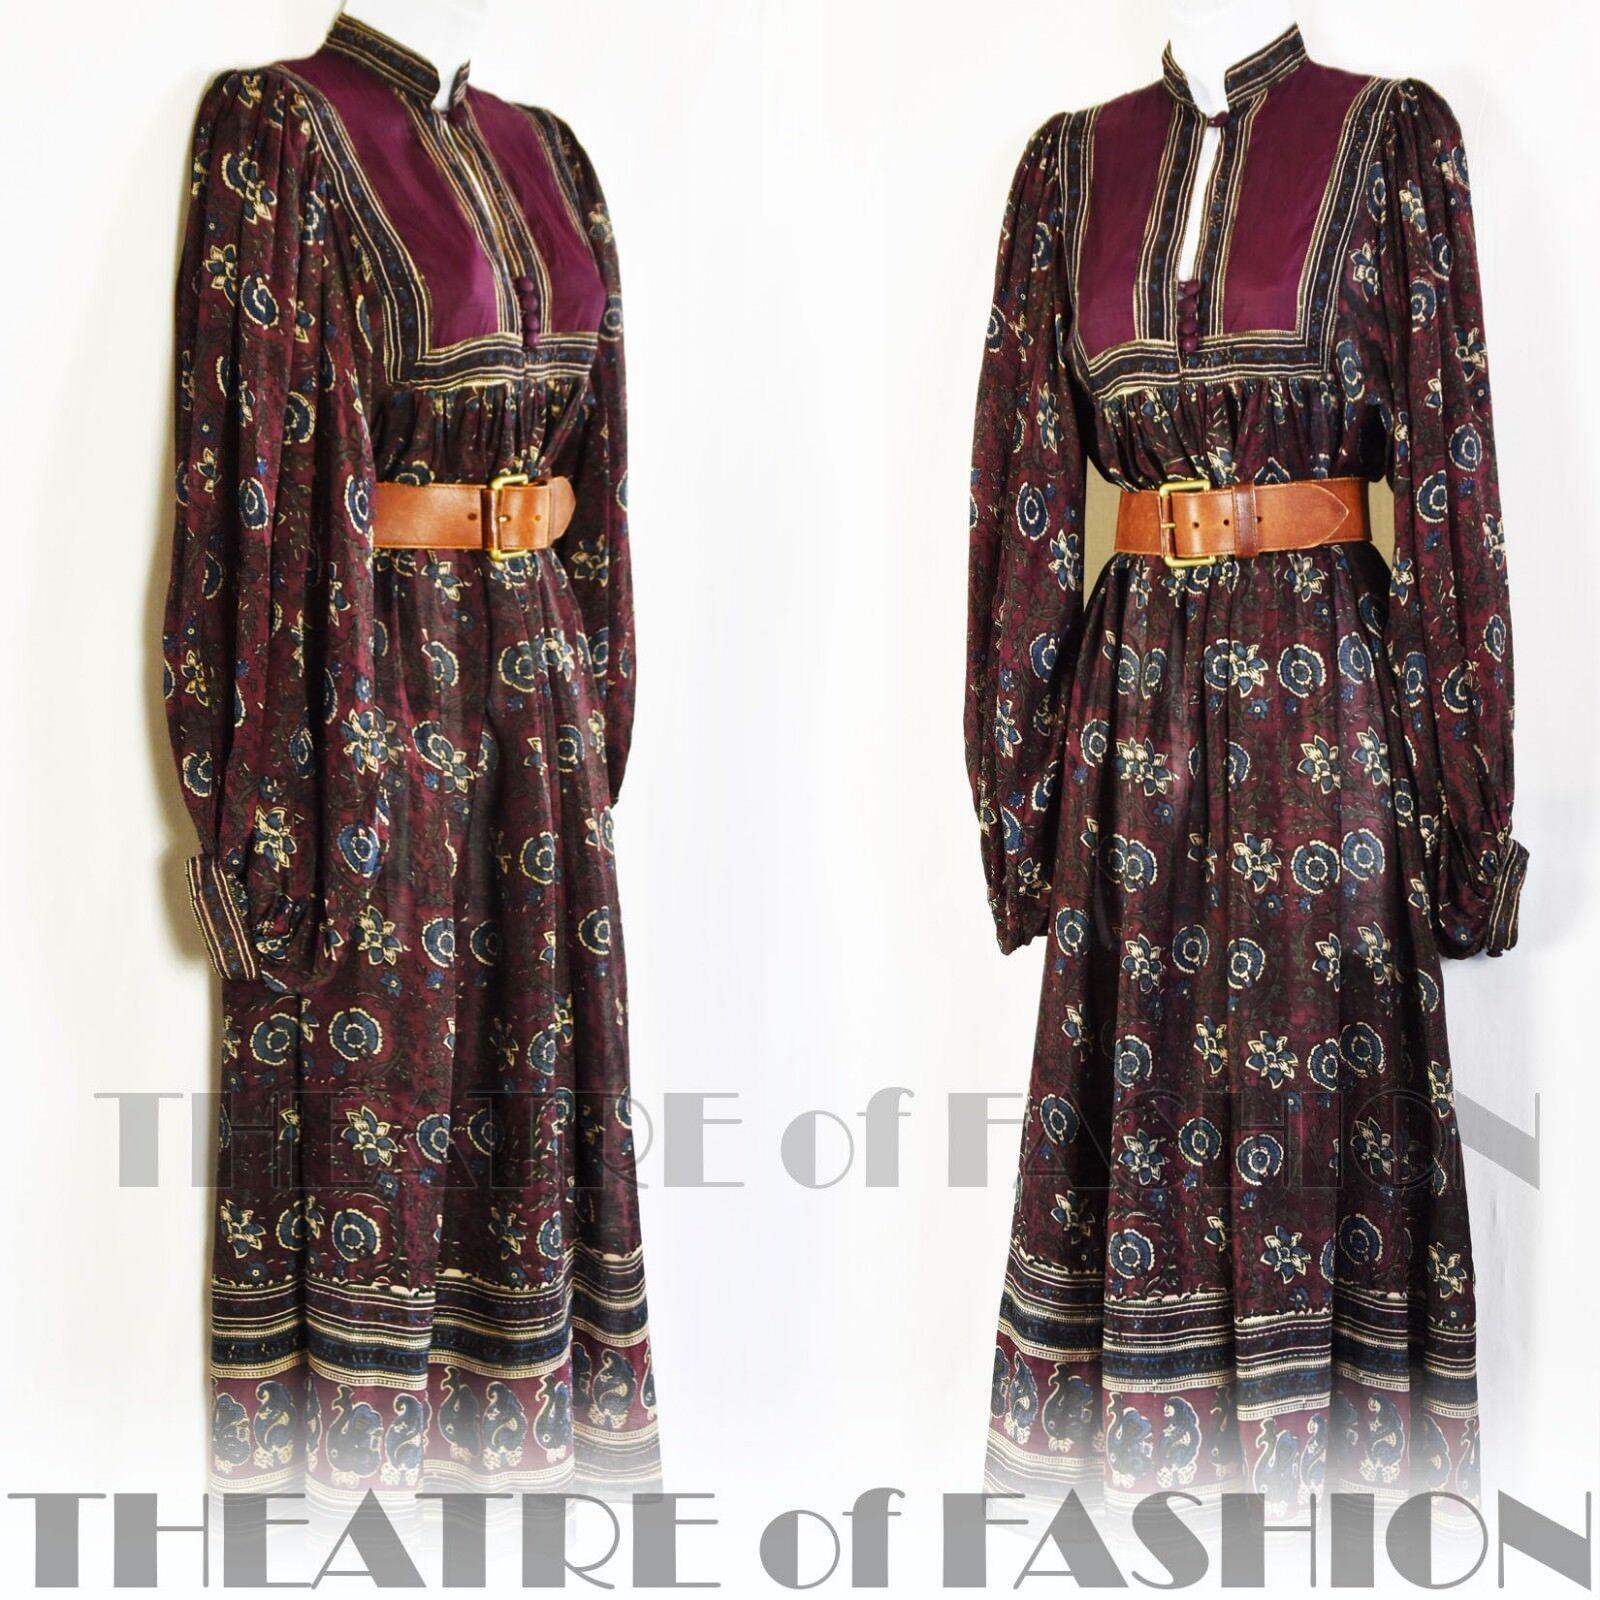 DRESS DRESS DRESS PHOOL INDIAN SILK VINTAGE BOHO WEDDING HIPPY-LUXE VAMP GODDESS FOLK BEAUTY 11135f